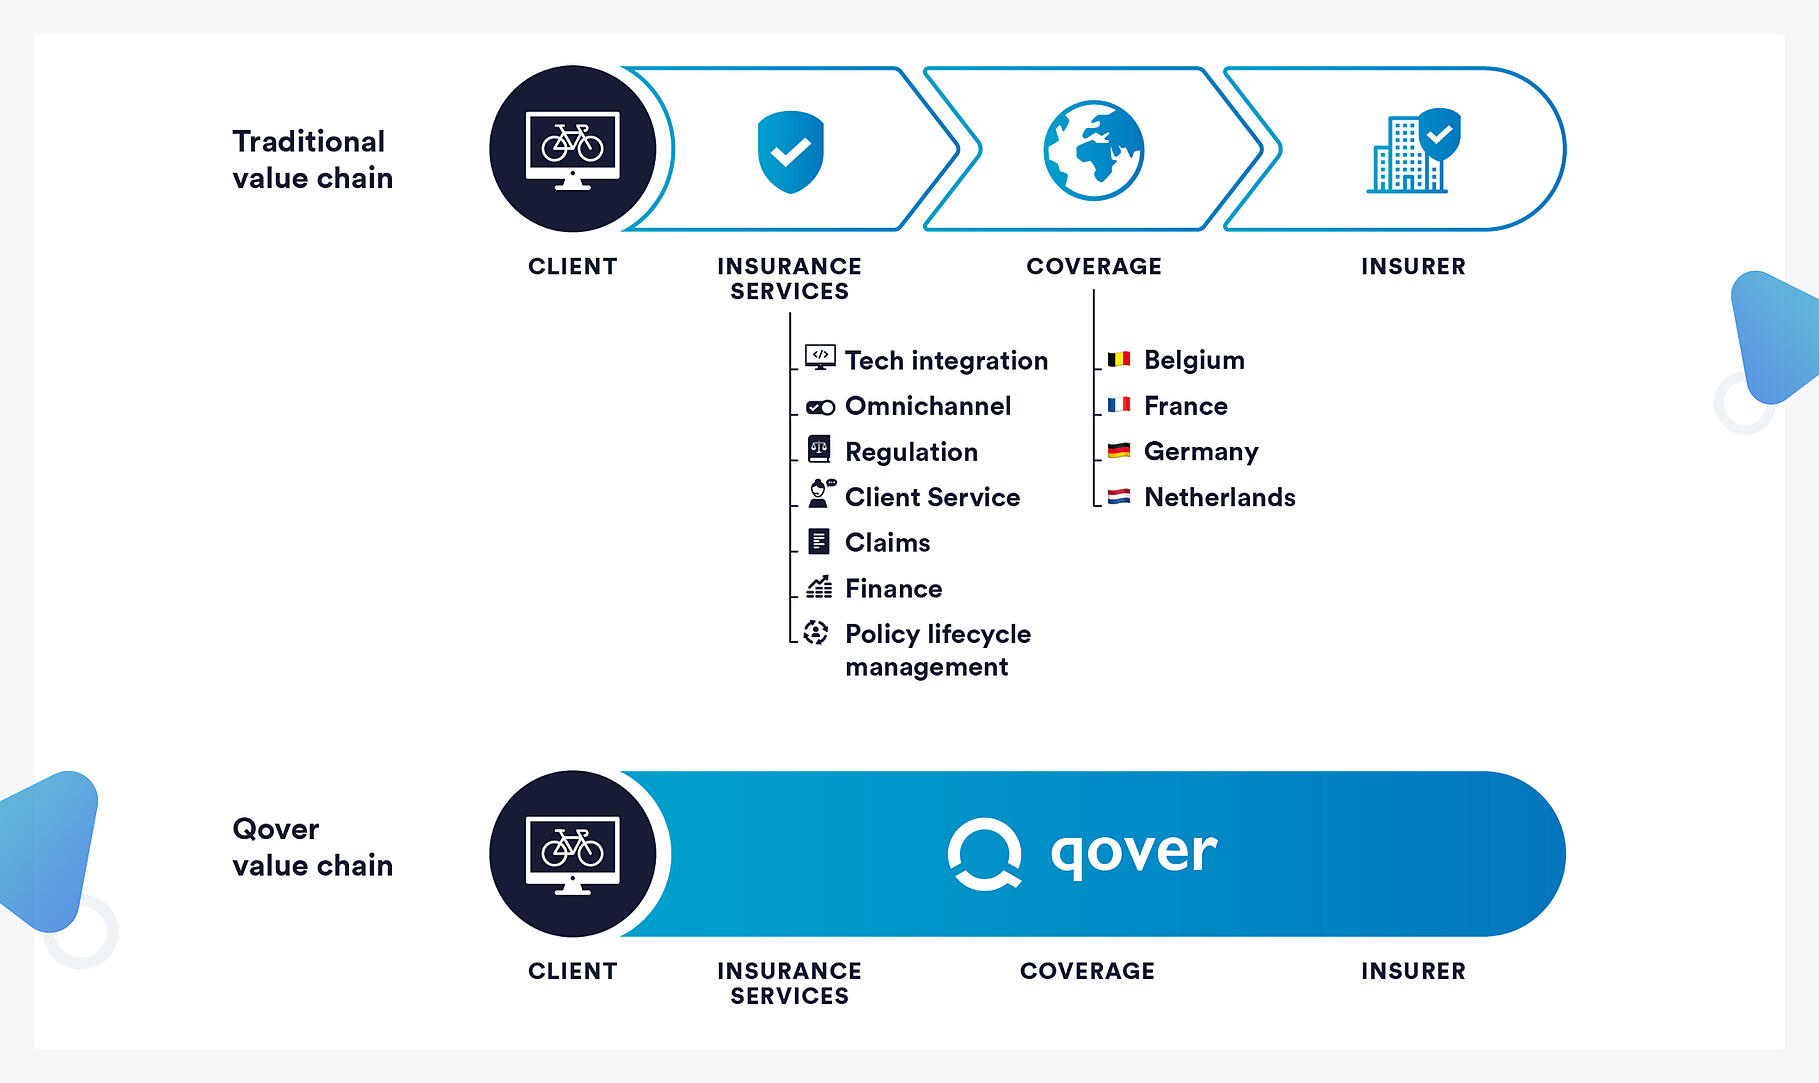 InsurTech Qover's insurance value chain